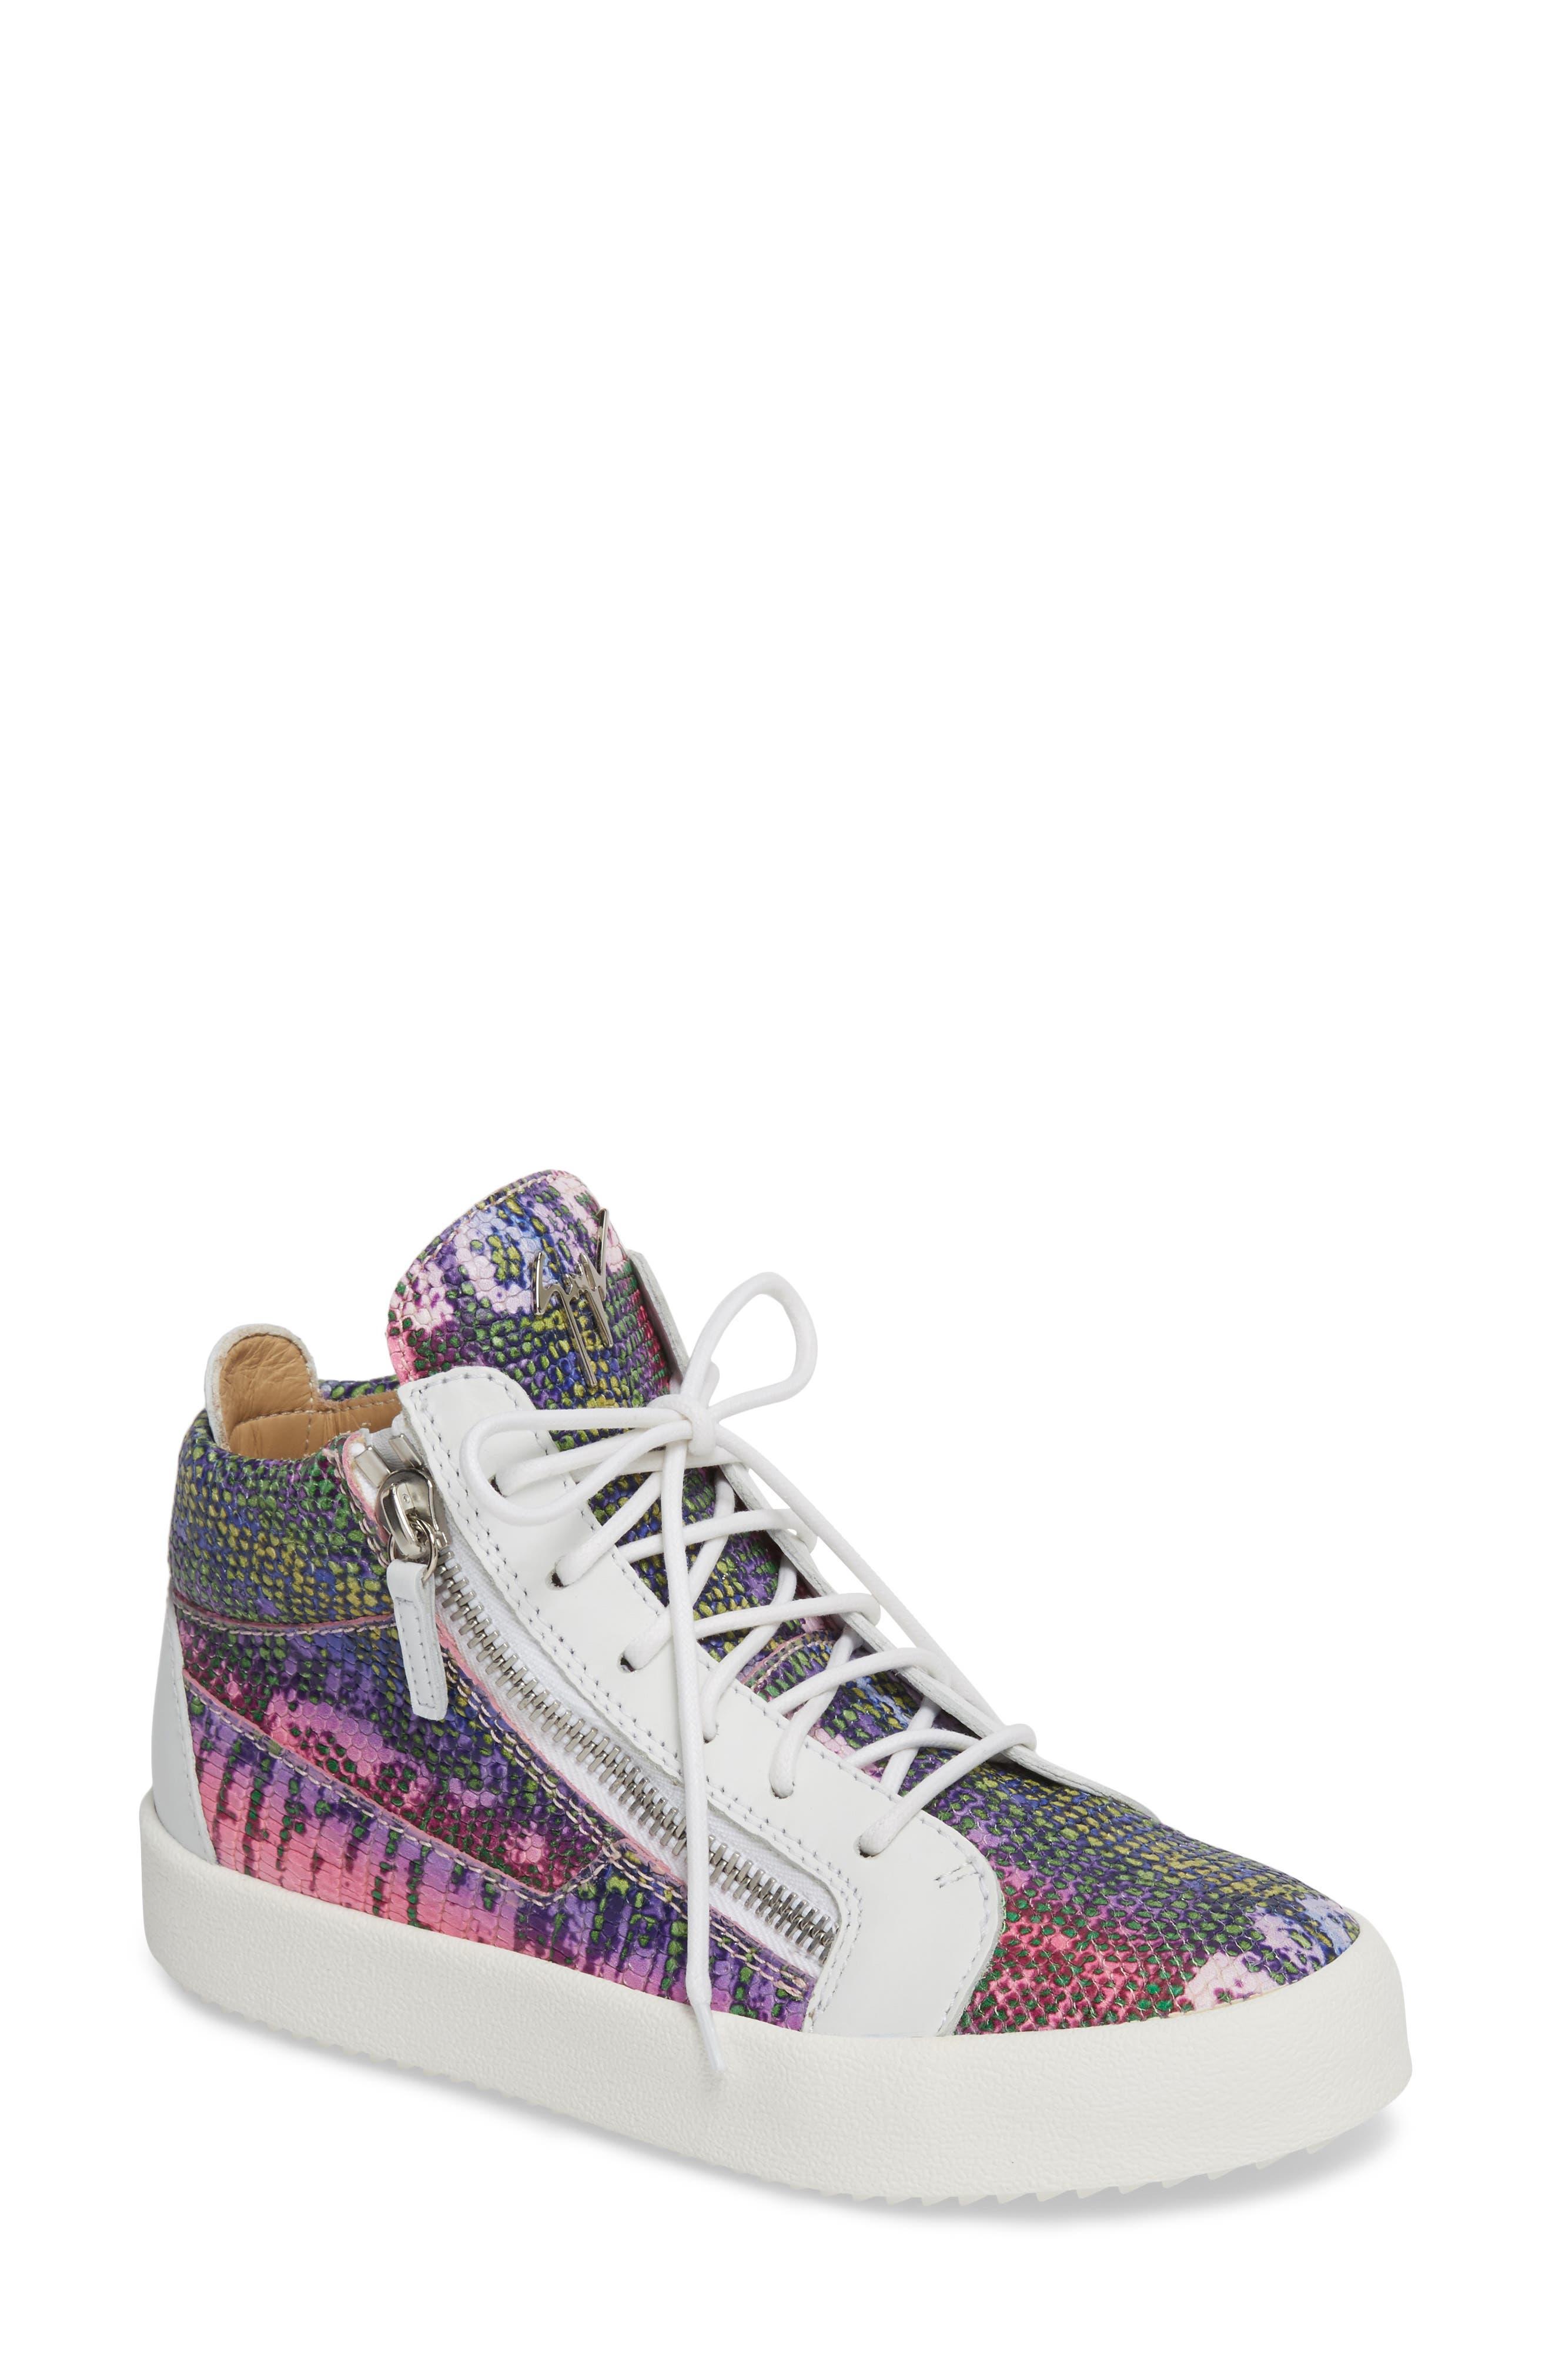 May London Mid Top Sneaker,                         Main,                         color, PINK MULTI